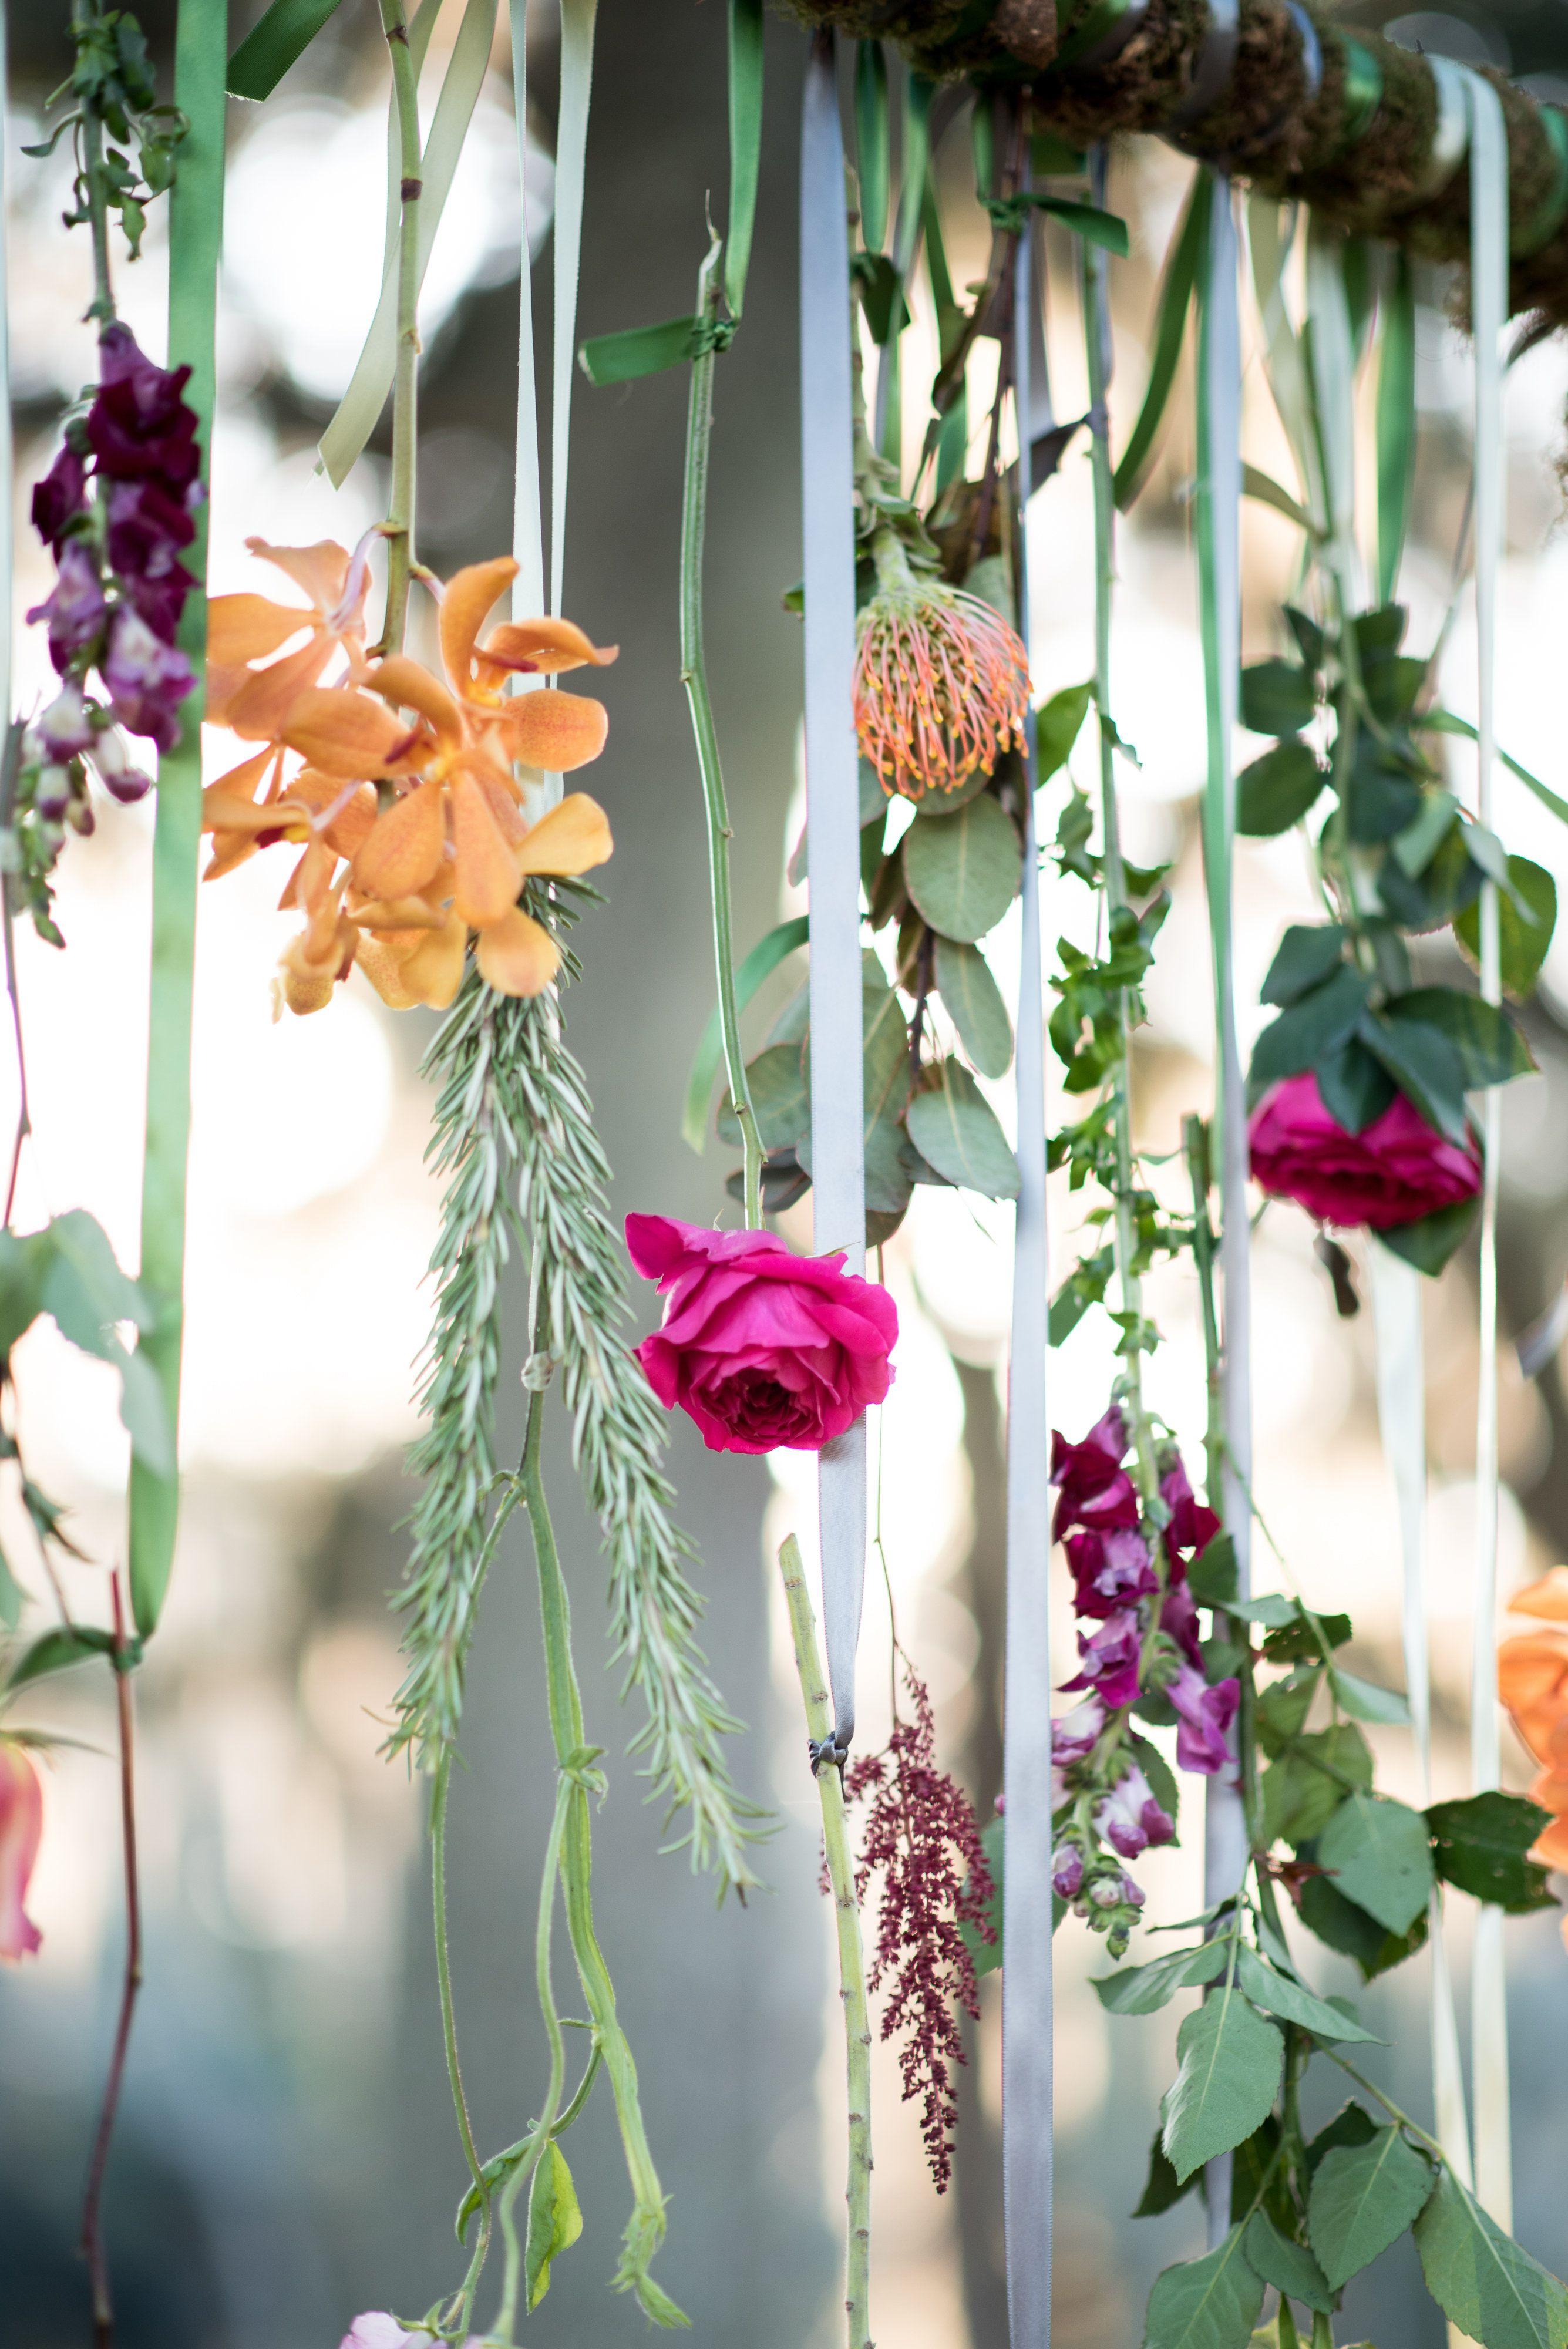 bohemian photoshoot - Google Search | Bohemian Style Guide ...  |Bohemian Style Flowers